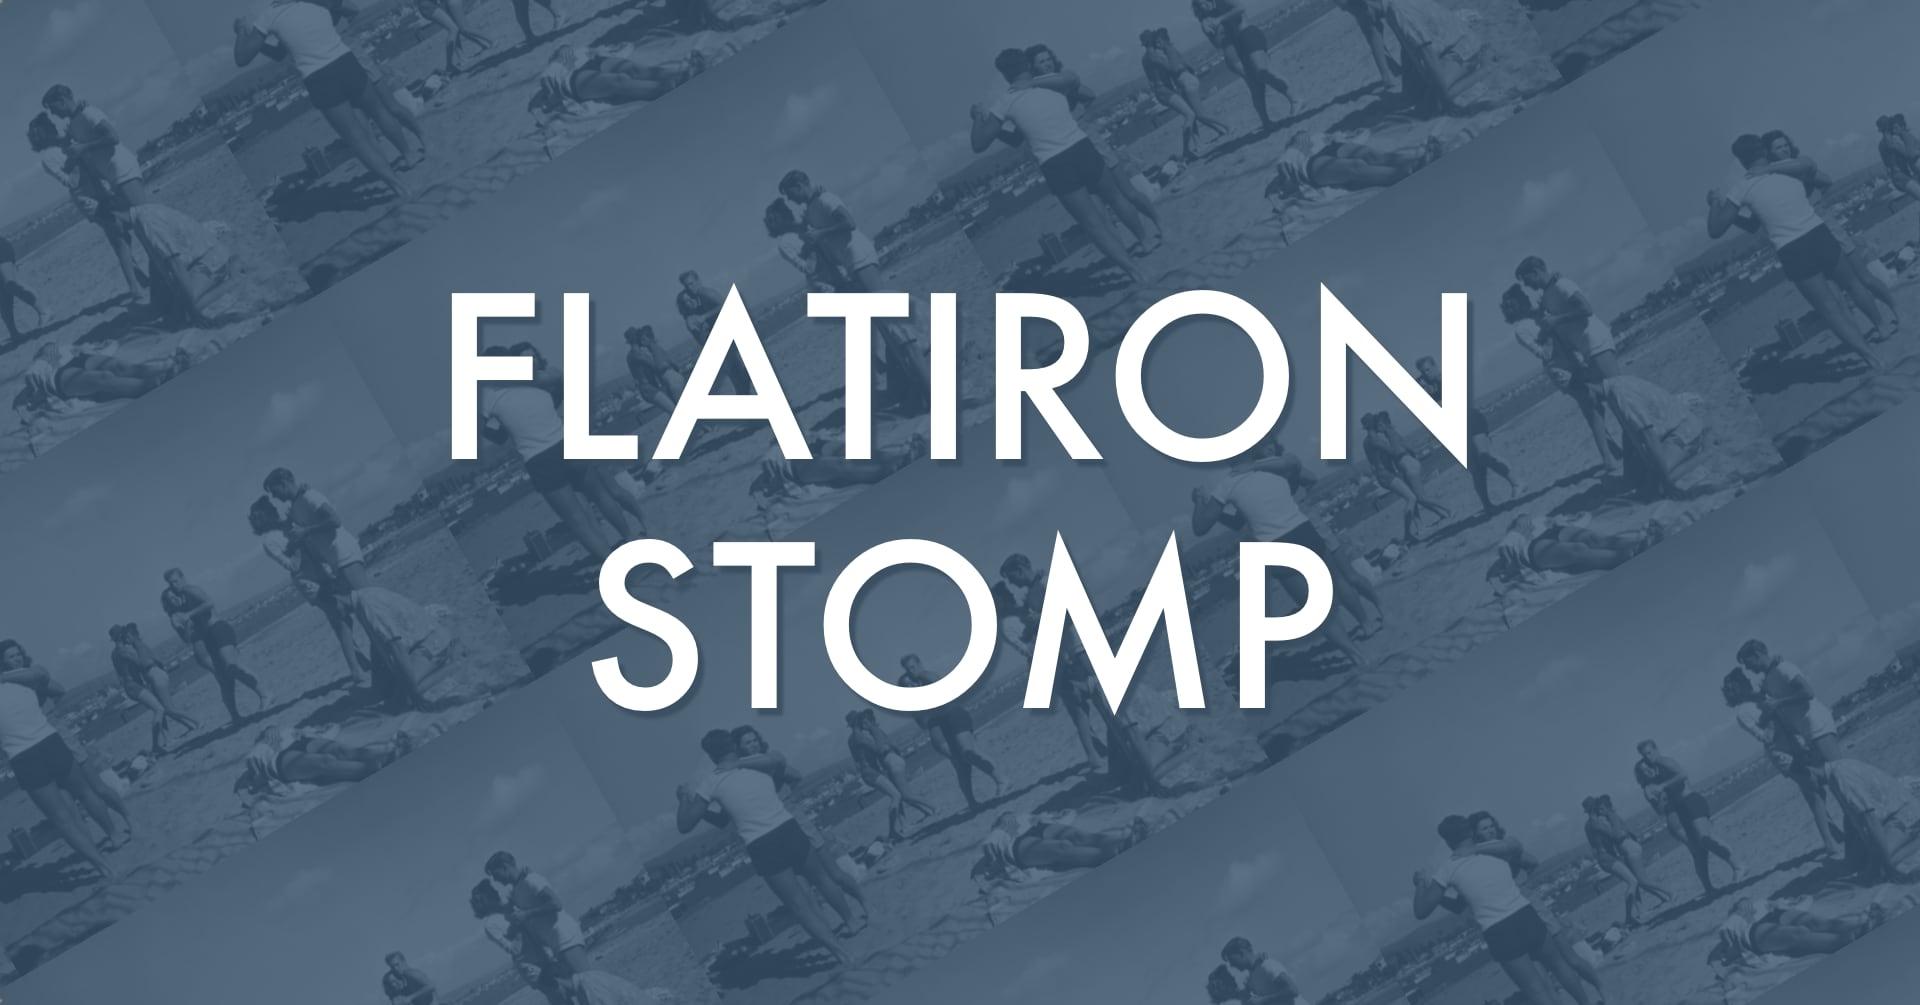 Flatiron Stomp.jpg